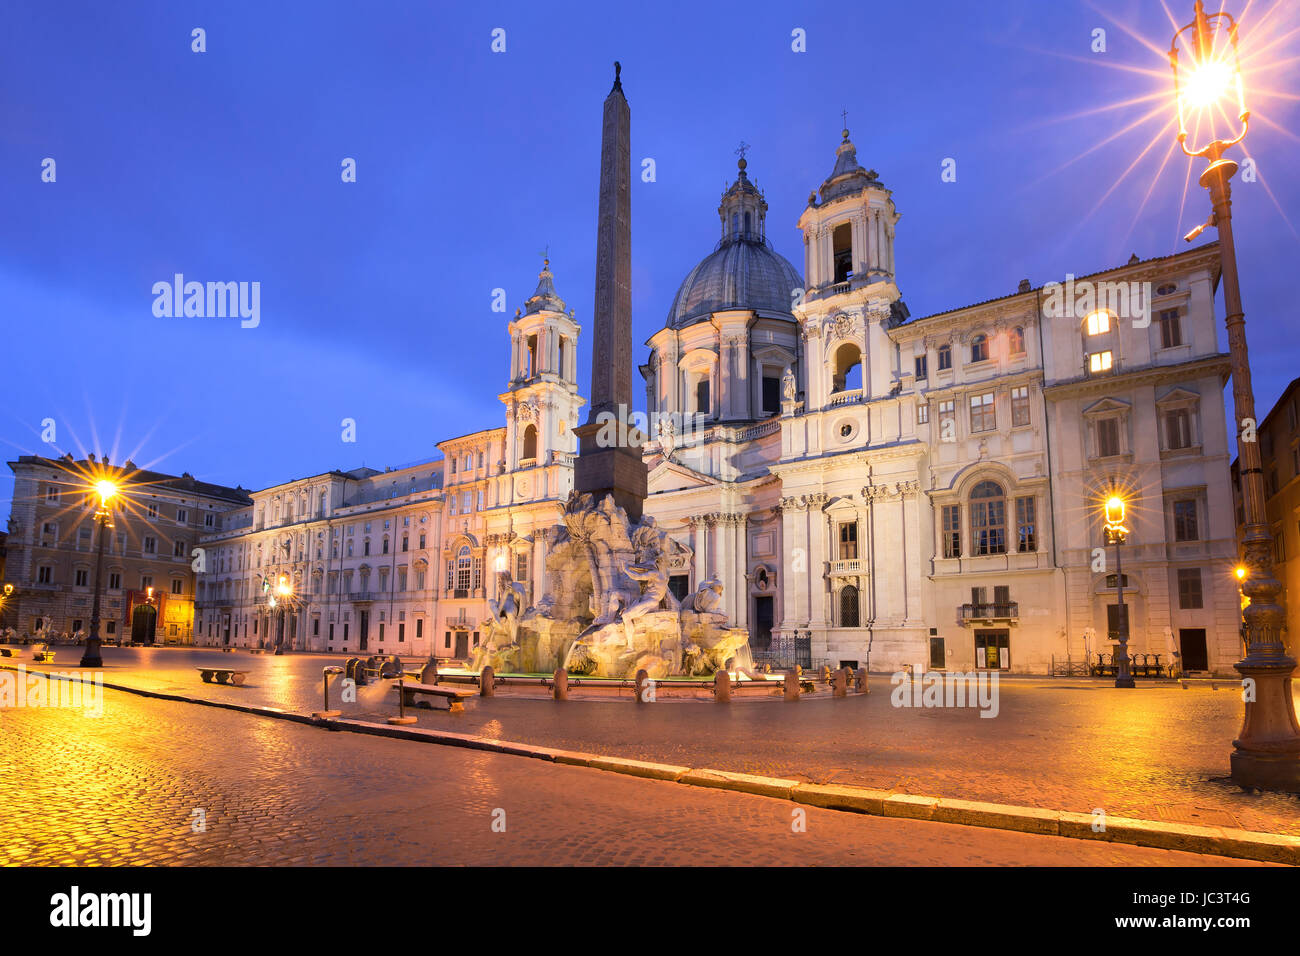 Piazza Navona en la noche, Roma, Italia. Imagen De Stock